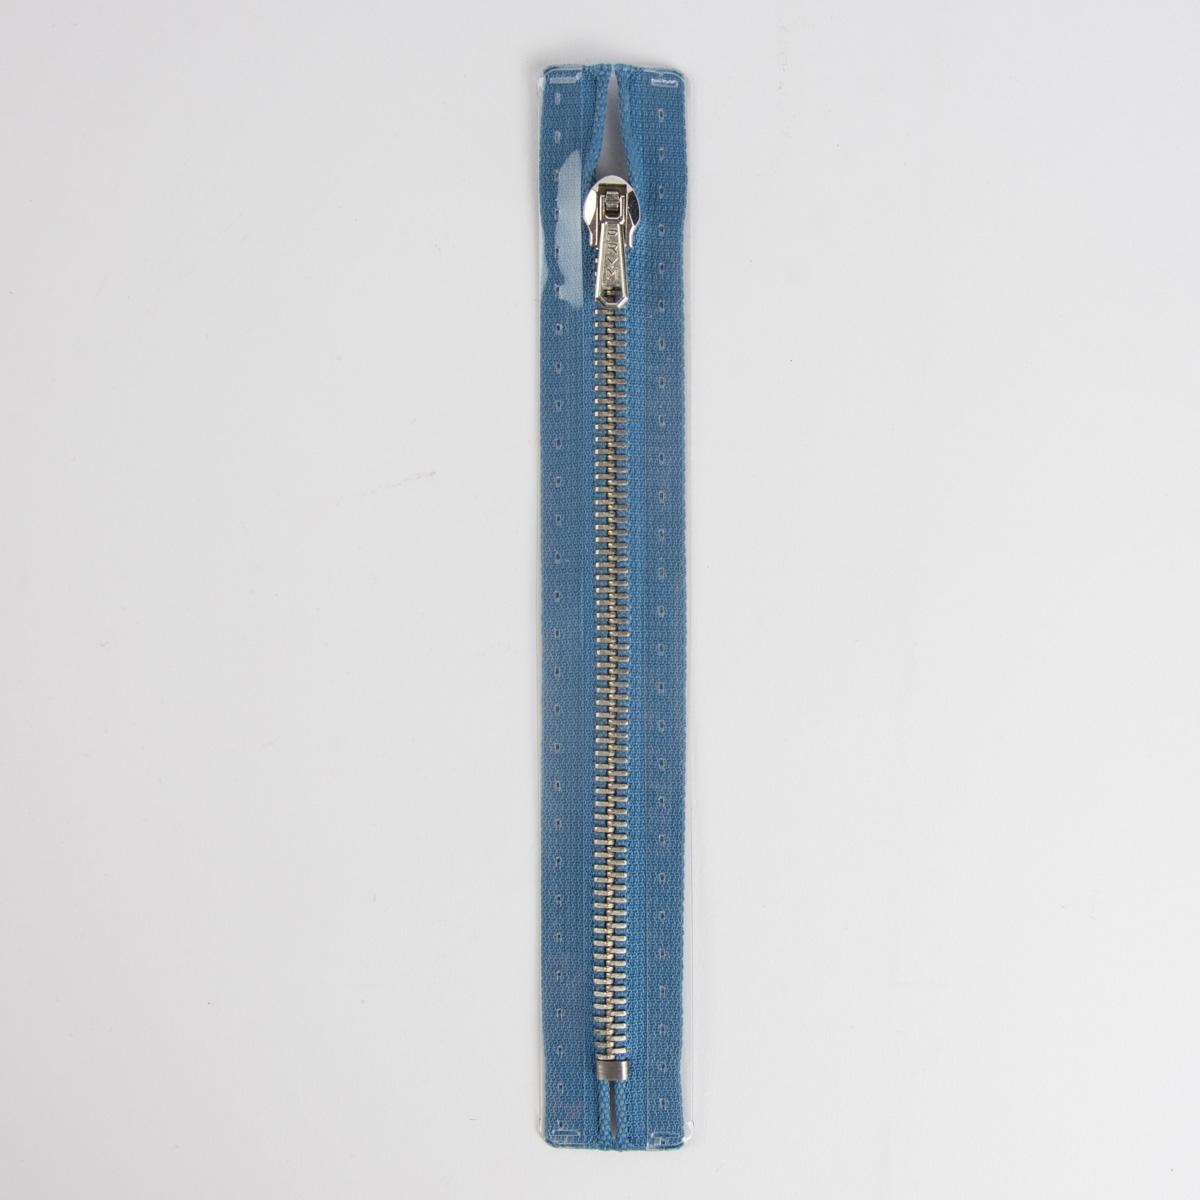 Reißverschluss M2 Typ 10 ut 20 cm si-fb Fla azurblau